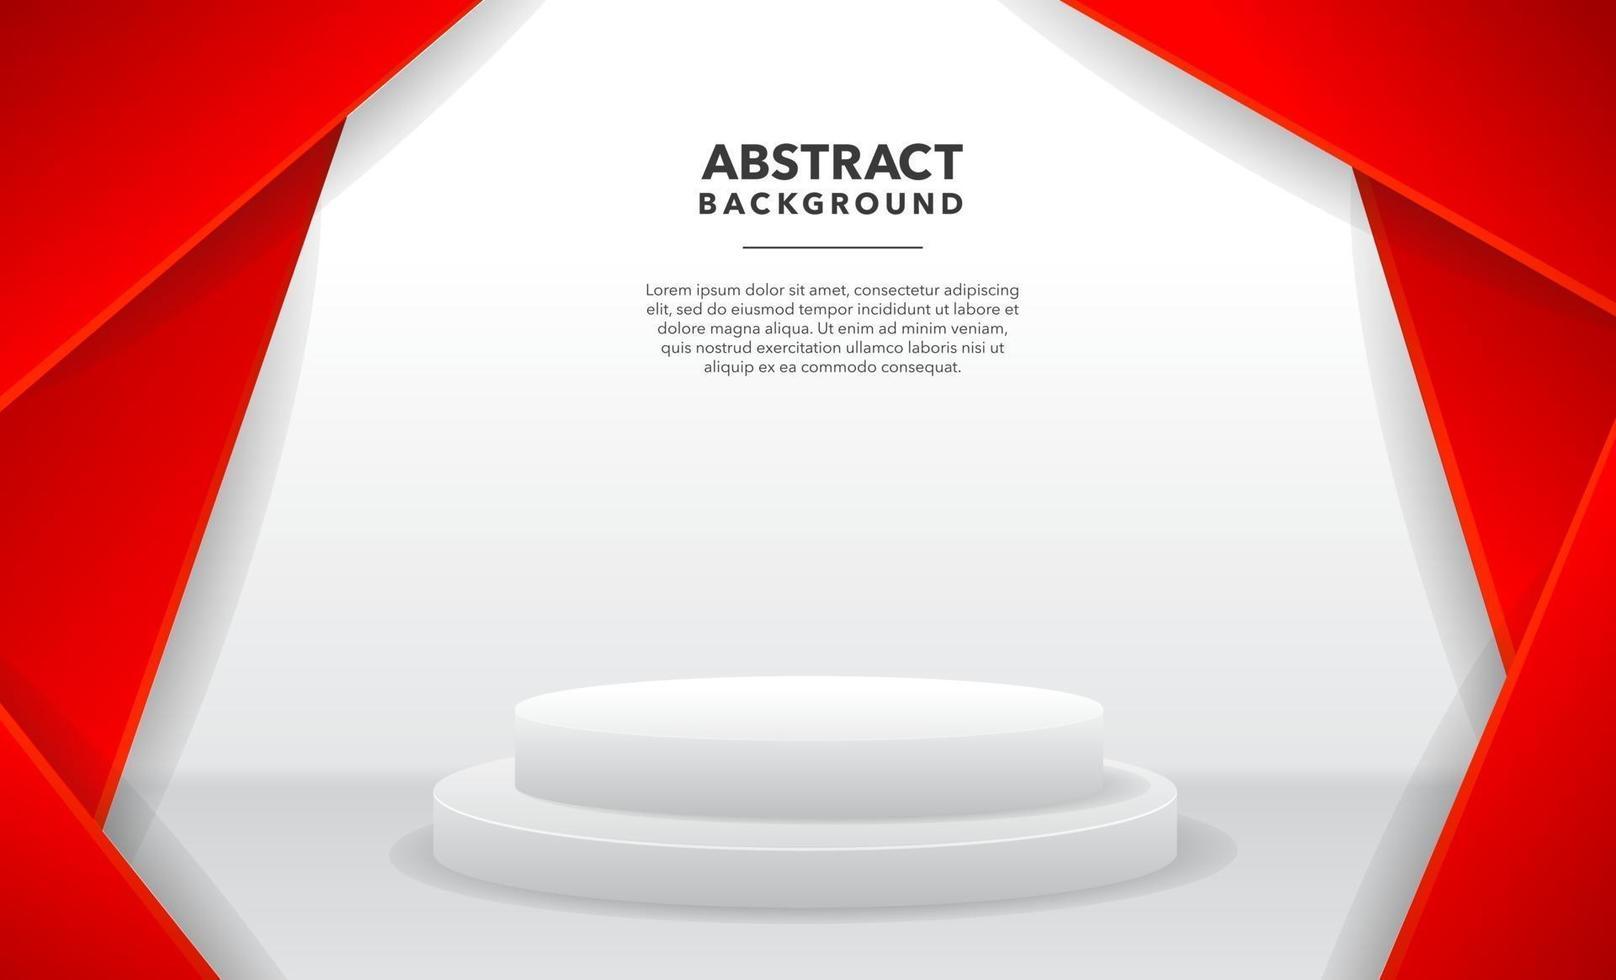 diseño de fondo abstracto moderno blanco rojo vector